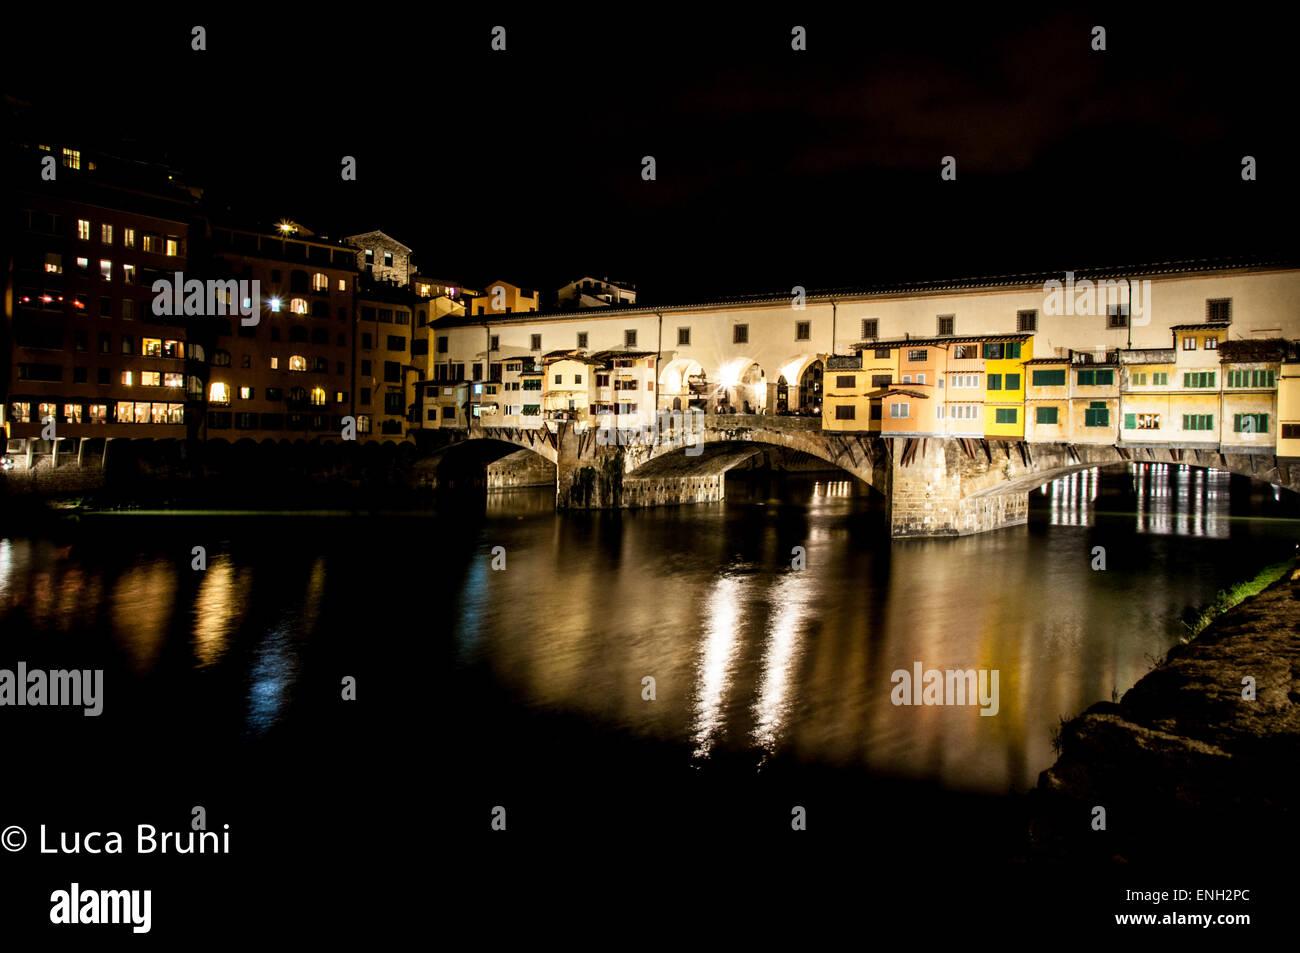 Week-end a Firenze Immagini Stock